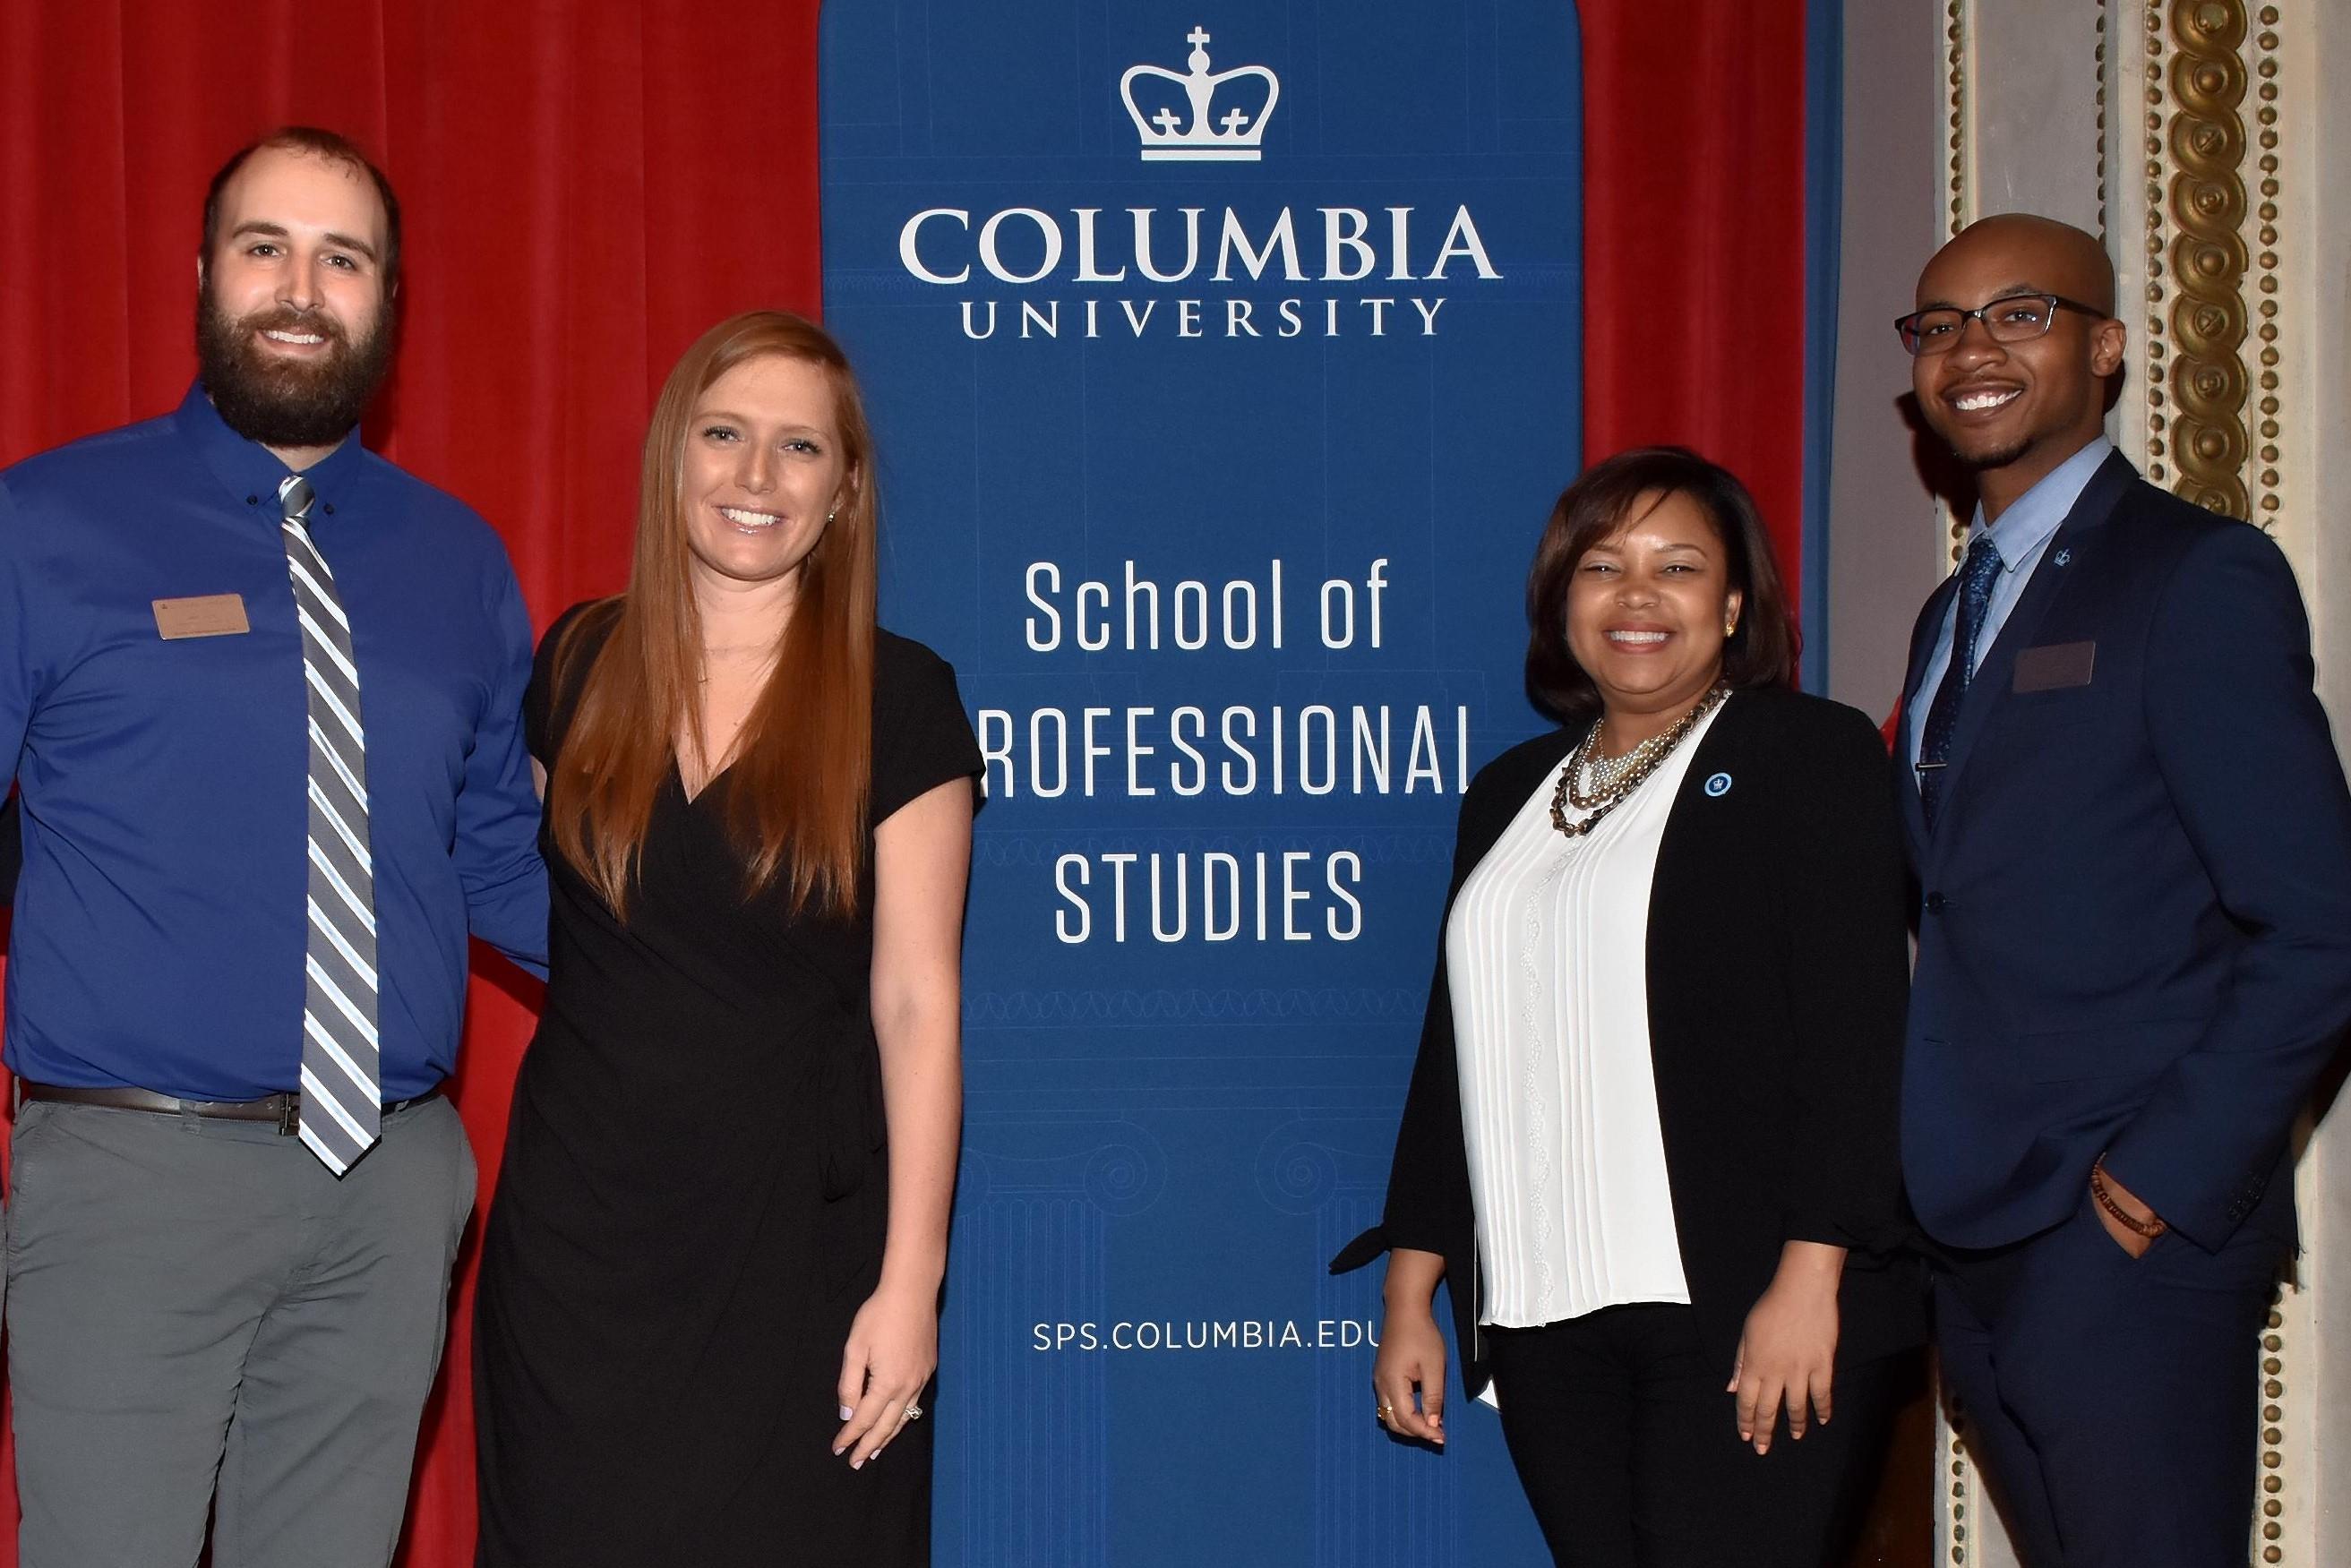 SPS Office of Student Life staff (from left to right): Jason Joyce, Tiffany Onorato, Dr. Tatum Thomas, and Joshua Mackey